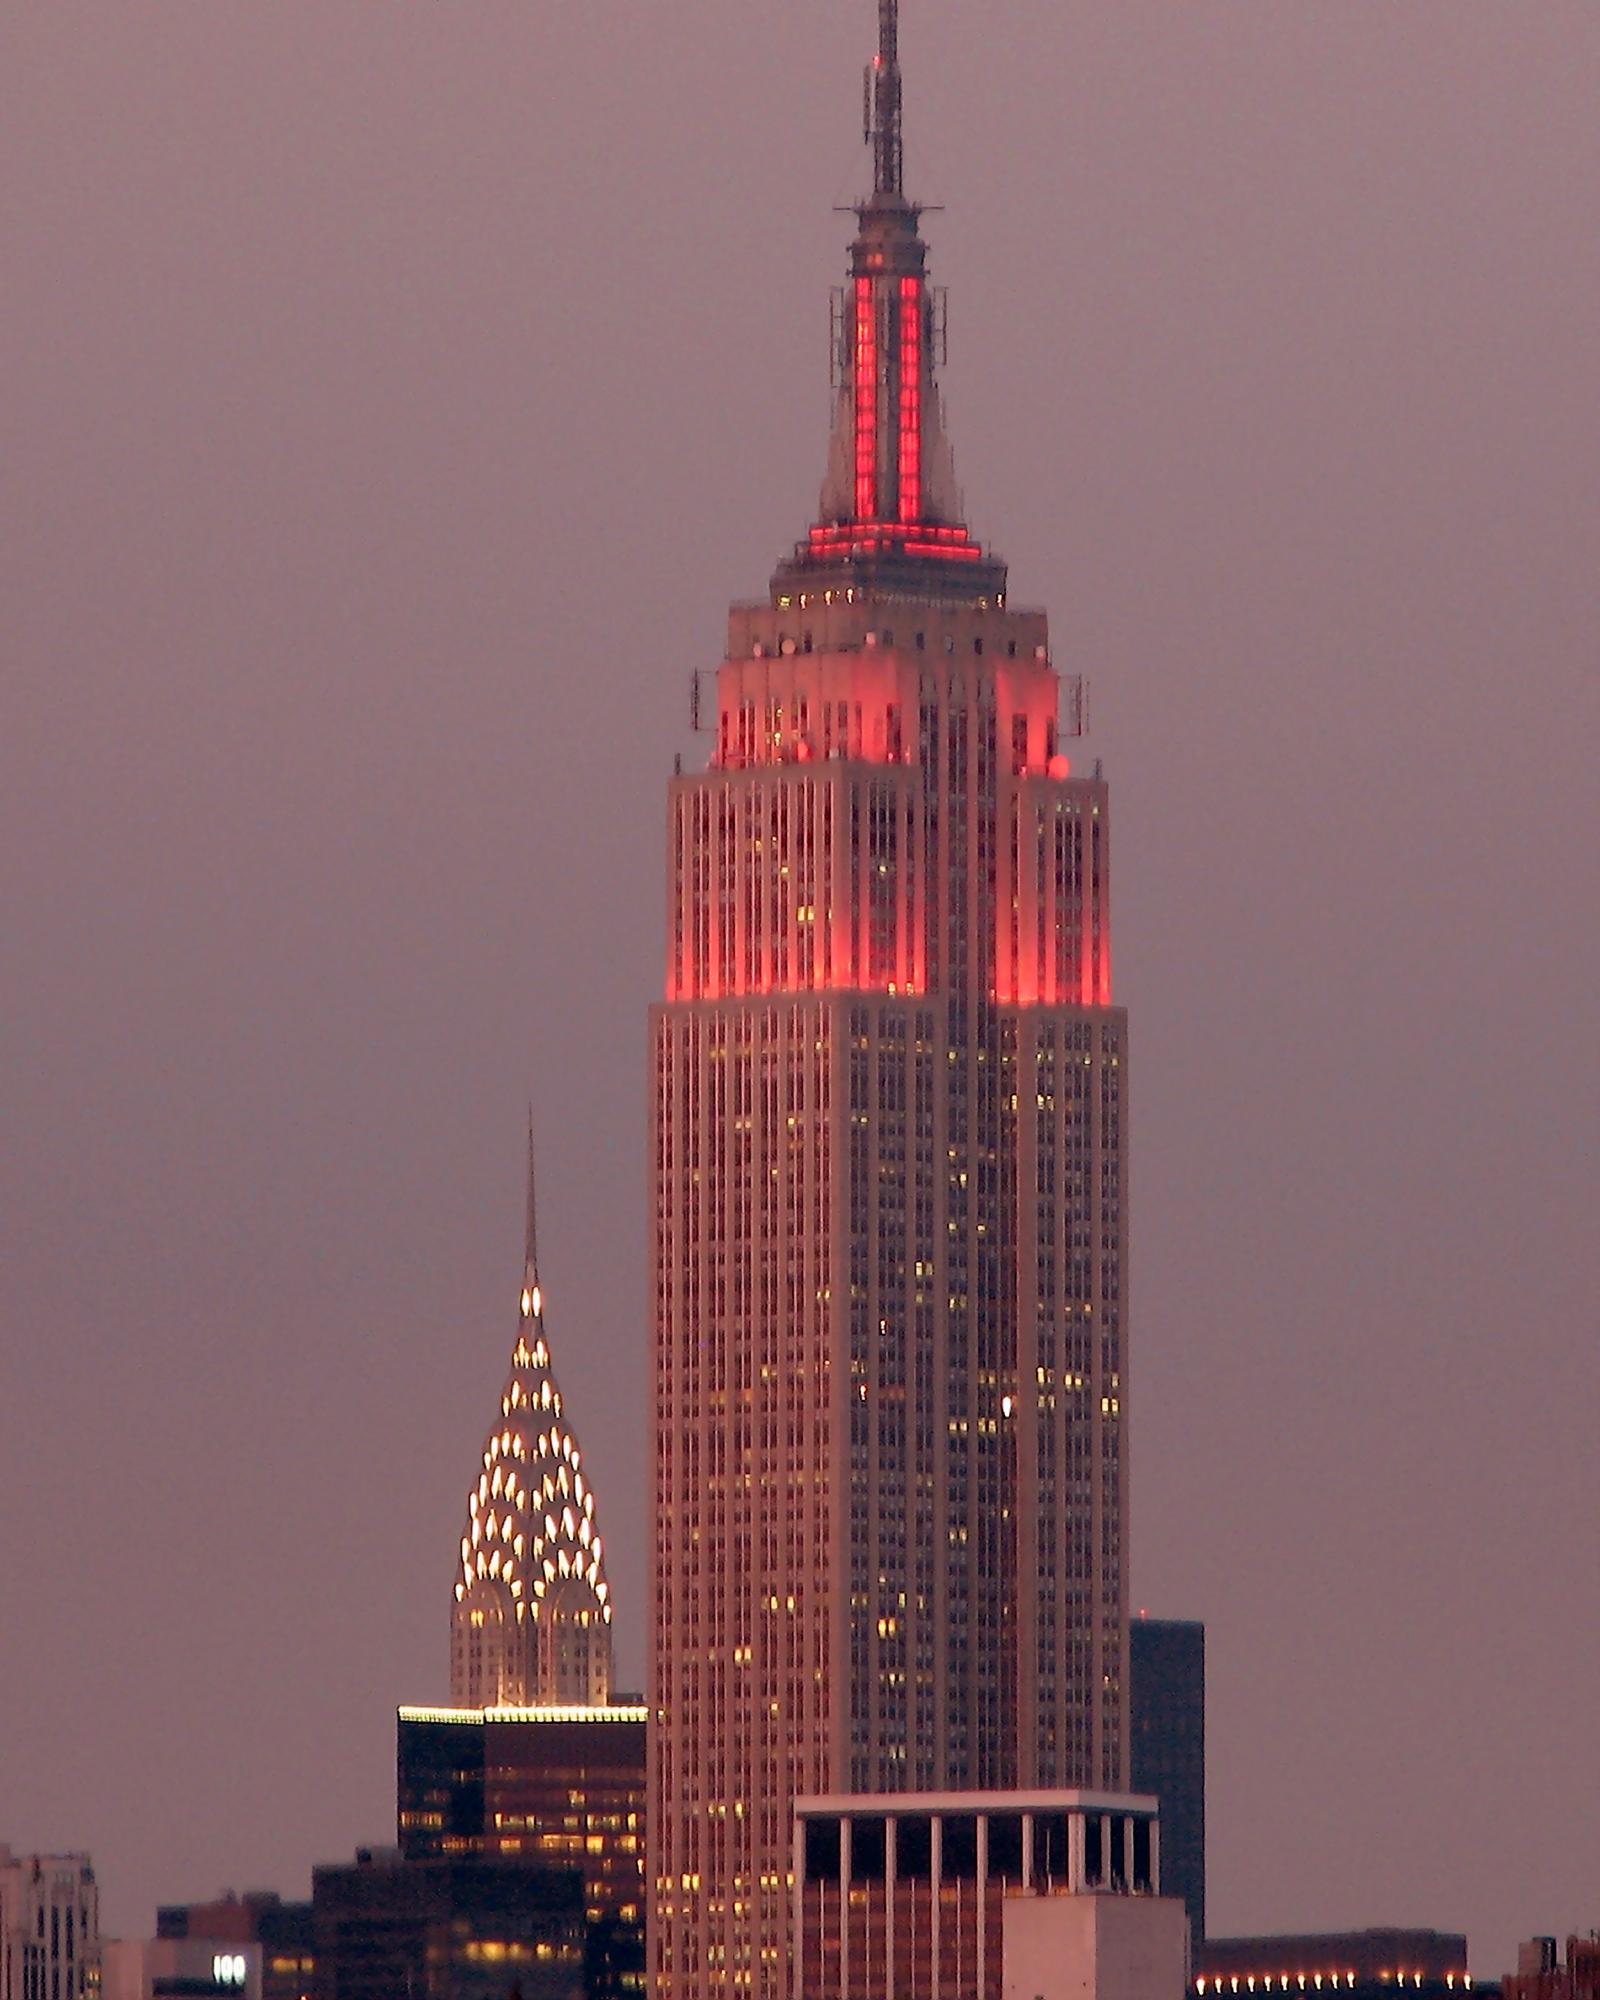 https://i0.wp.com/upload.wikimedia.org/wikipedia/commons/d/d2/Manhattan_at_Dusk_by_slonecker.jpg